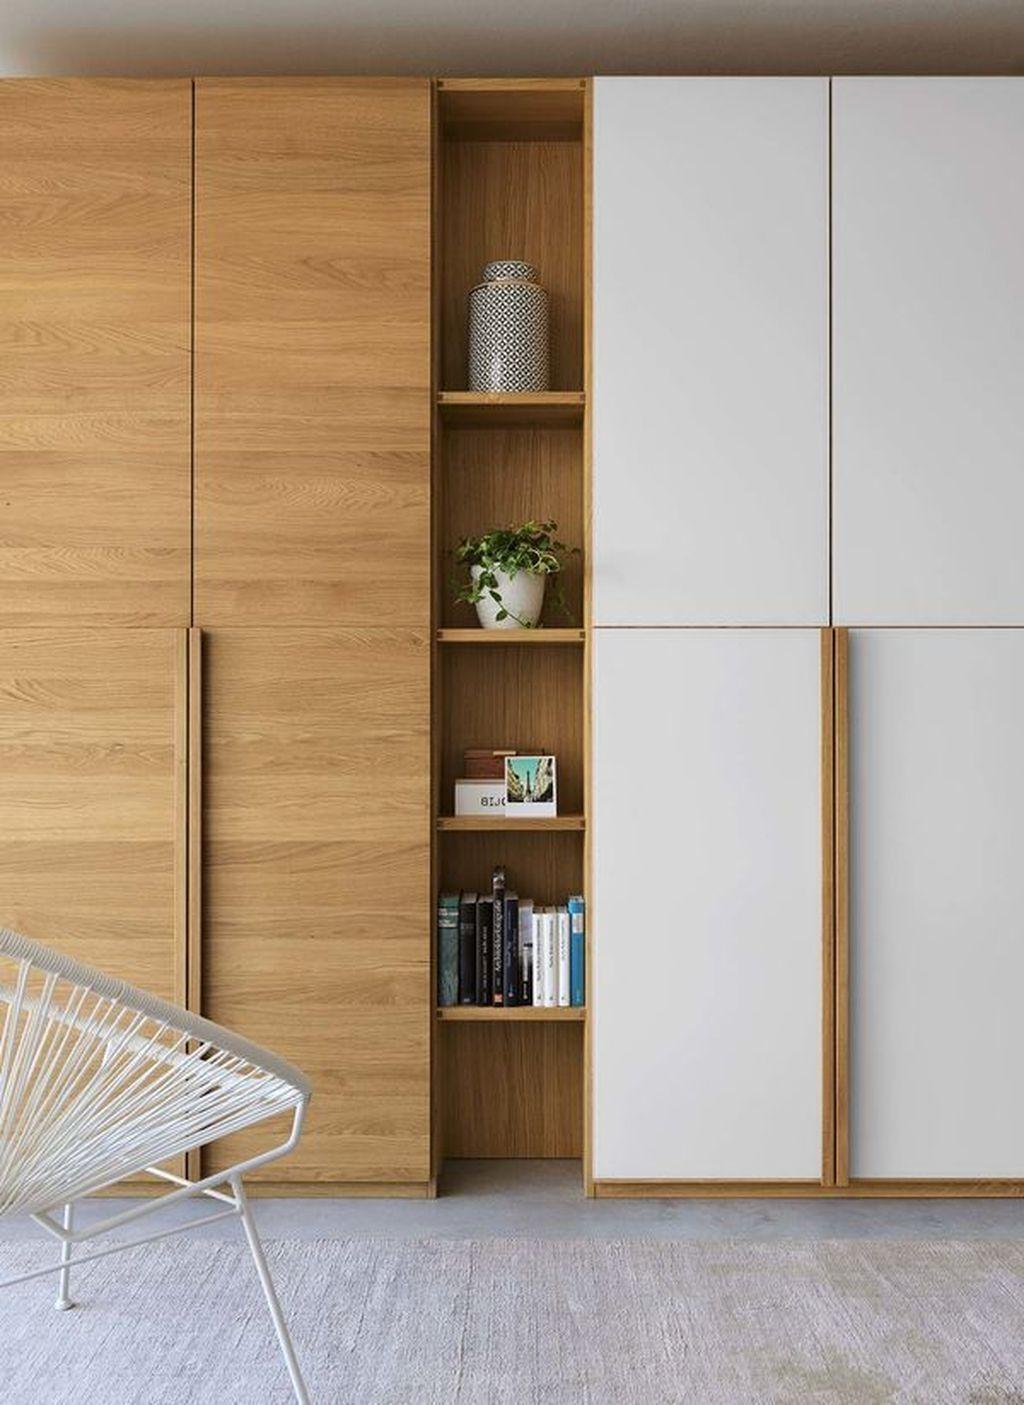 20 Elegant Wardrobe Design Ideas For Your Small Bedroom Bedroom Furniture Design Wardrobe Door Designs Bedroom Closet Design